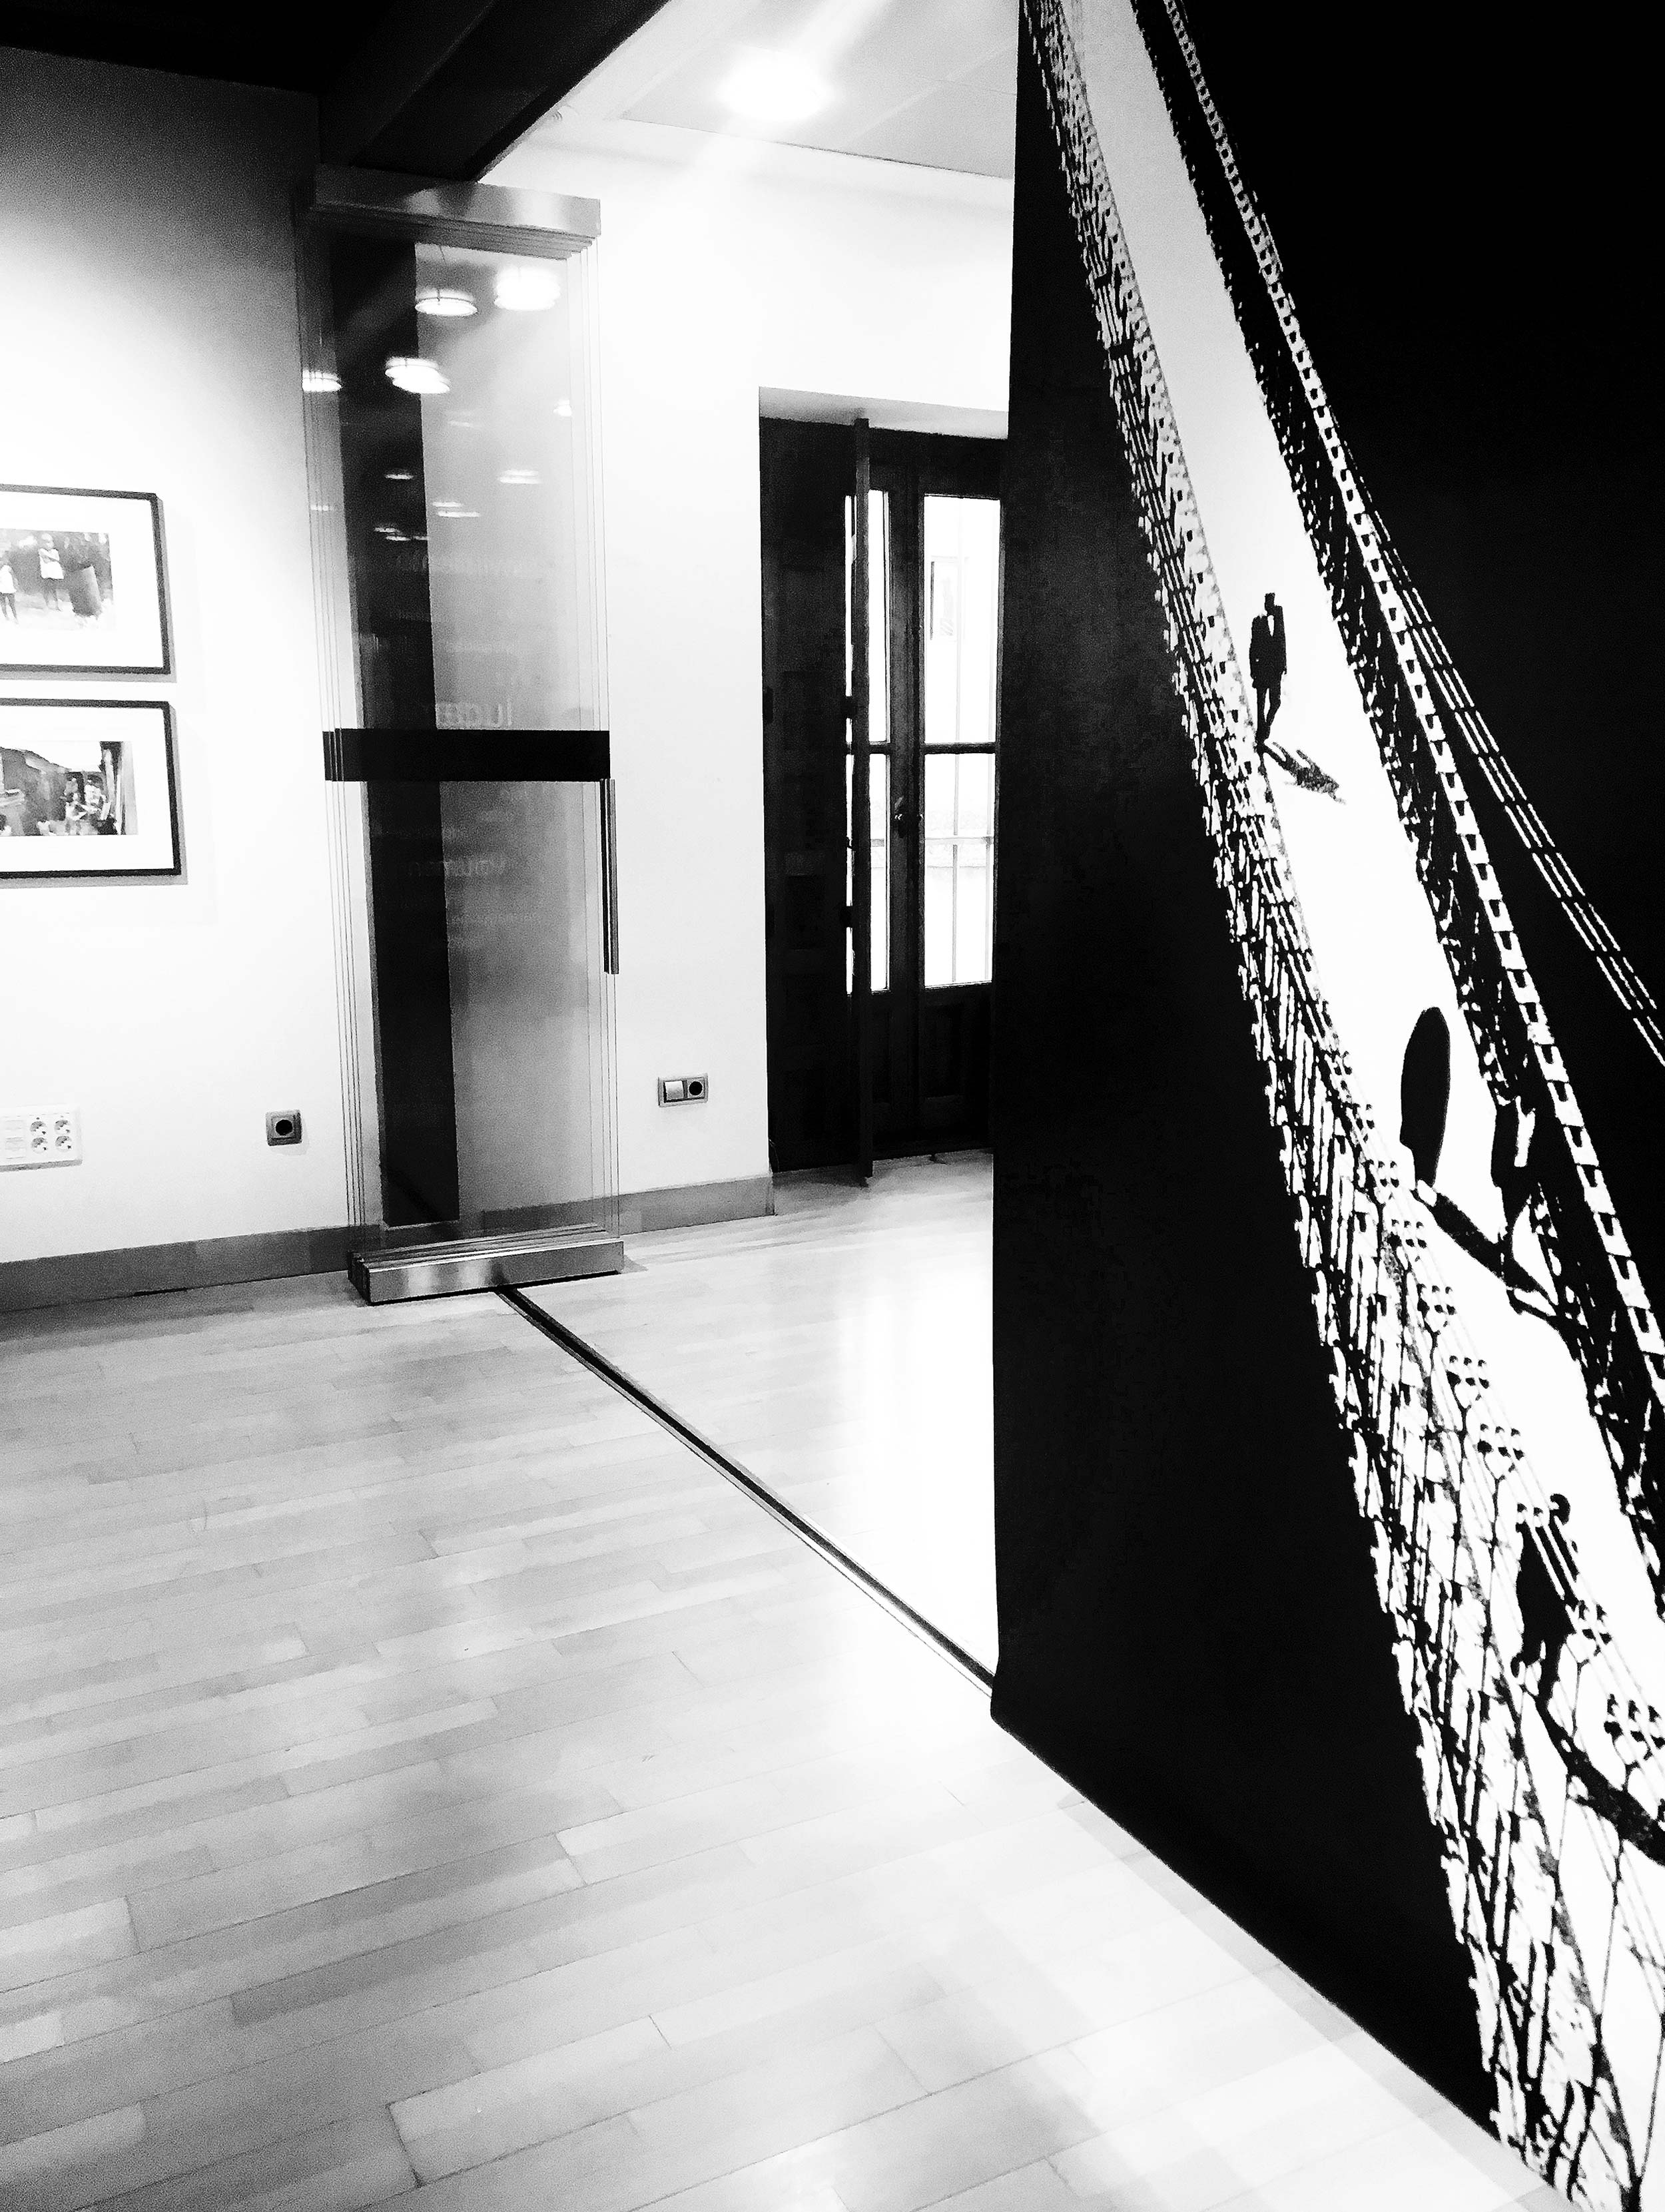 Avila-COACYLE-JGolblatt-apartheid-exhibition-47.jpg